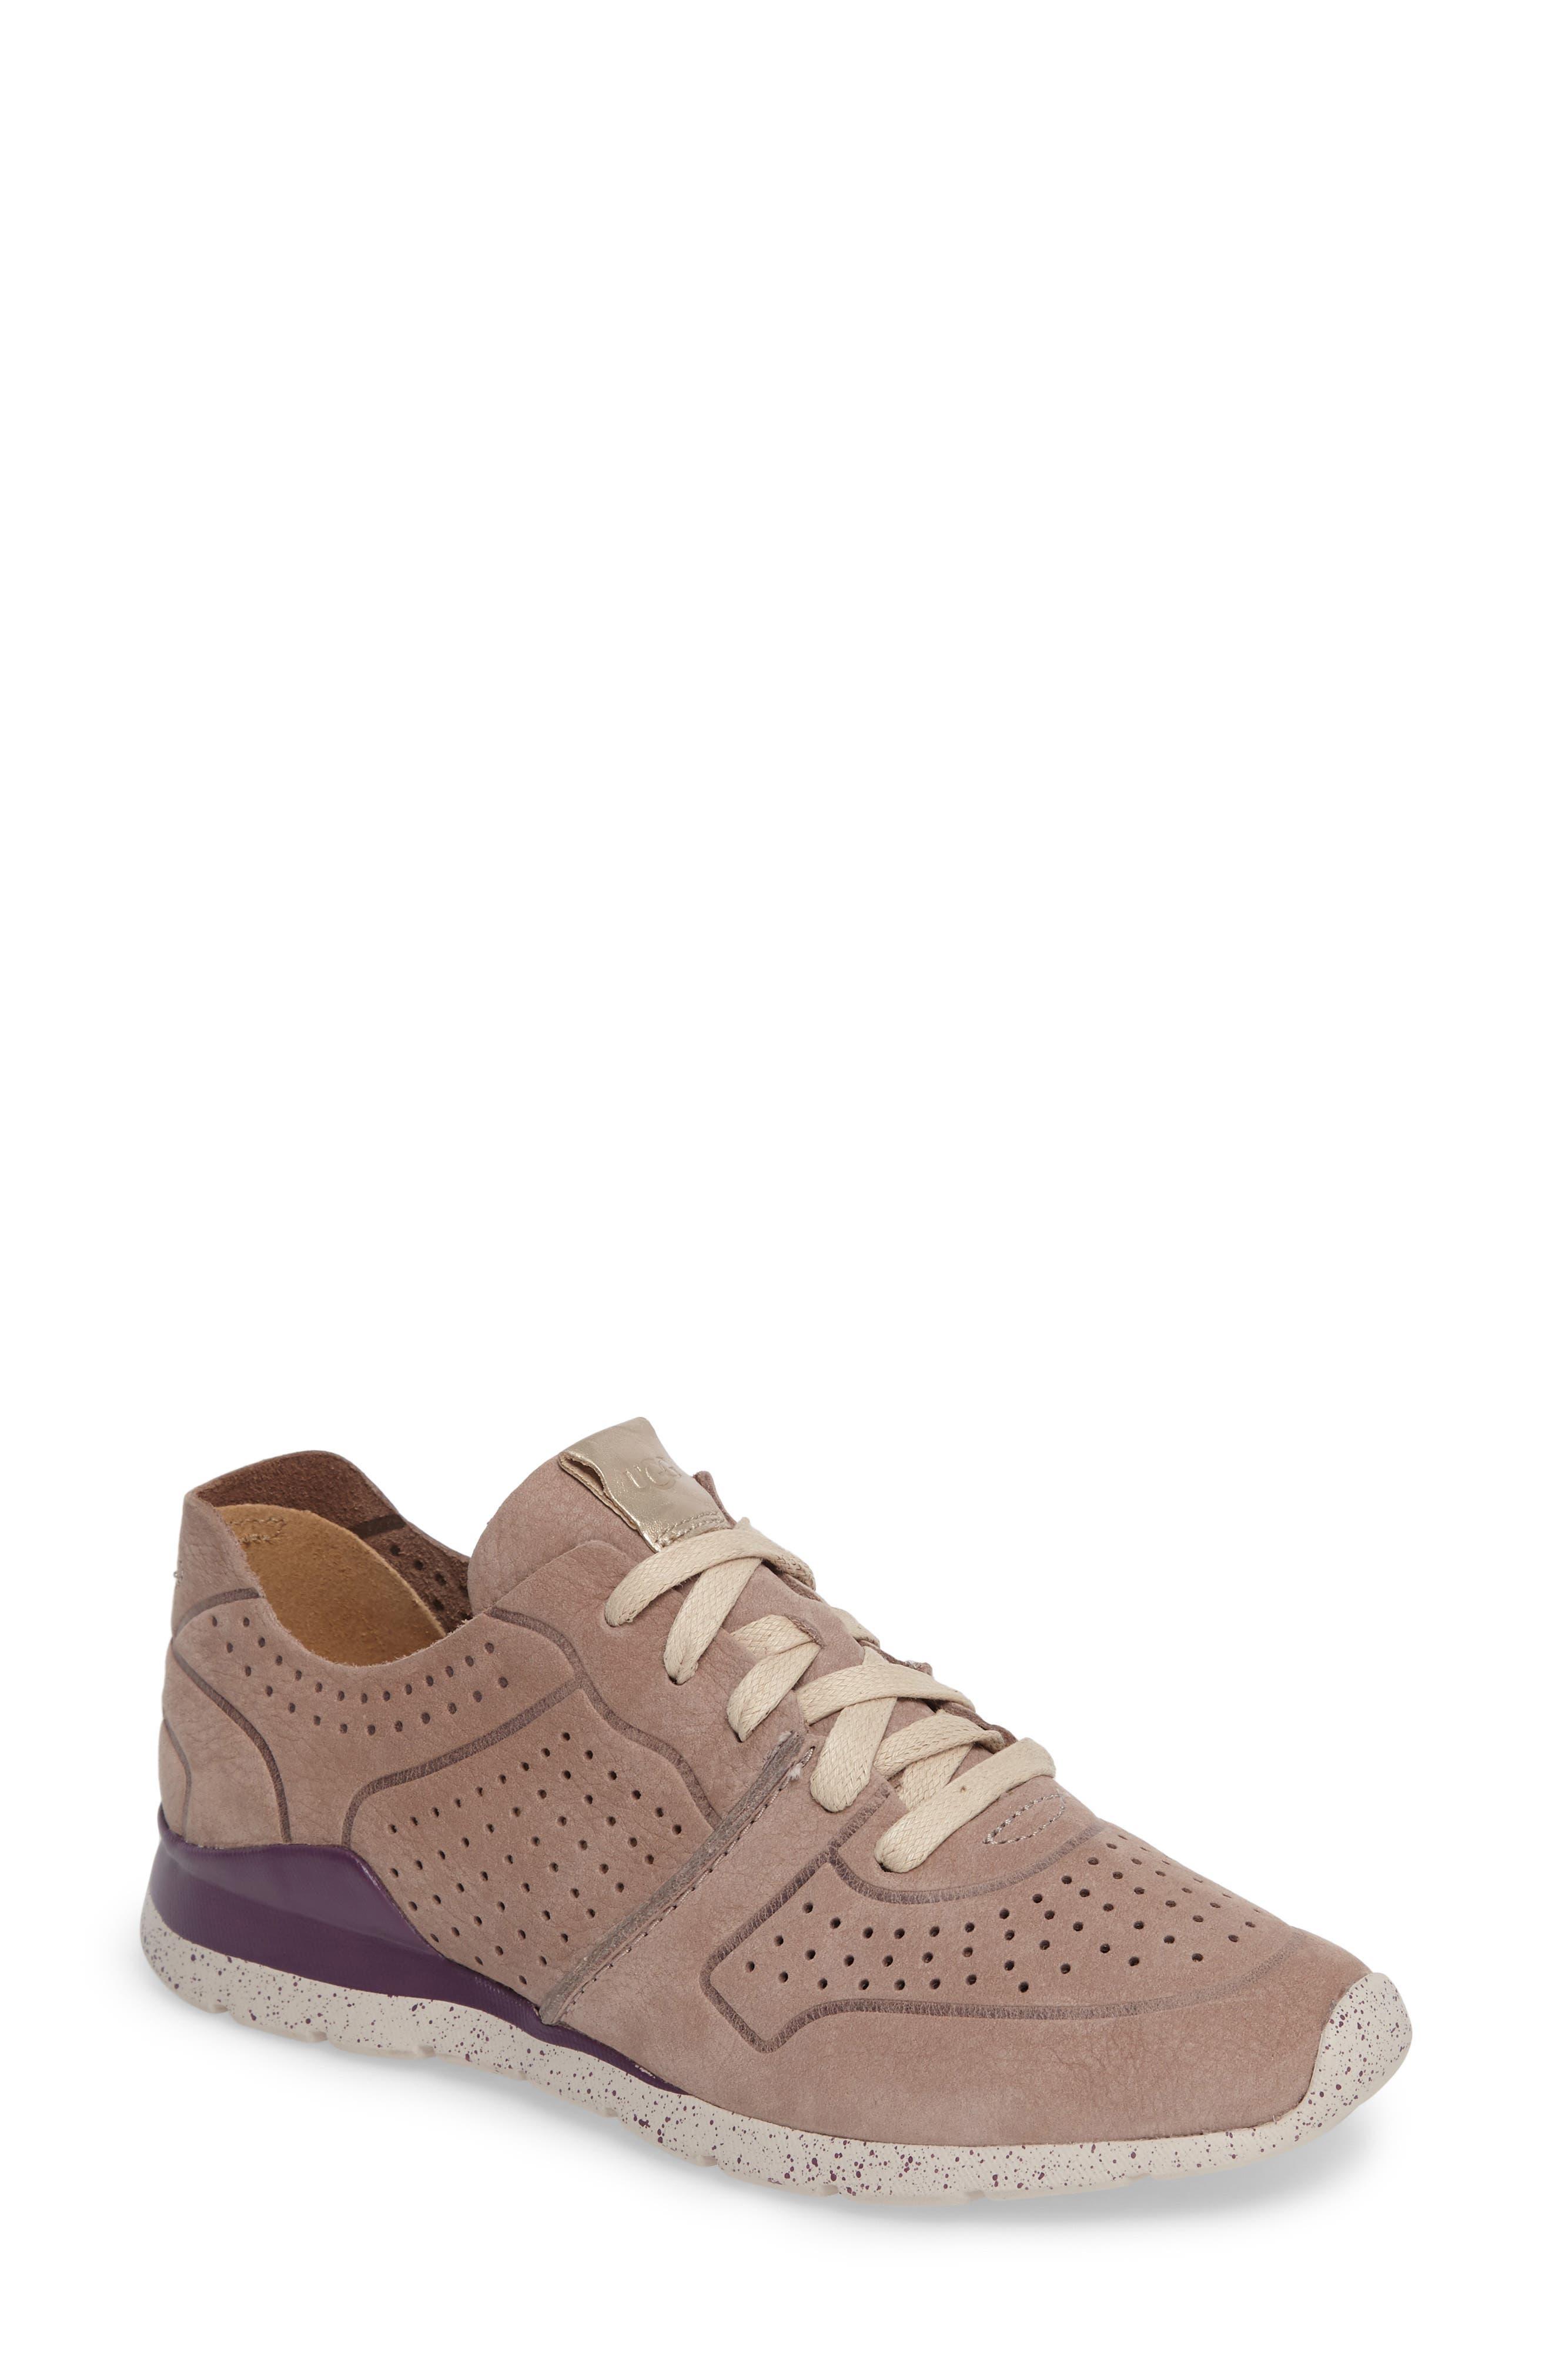 Main Image - UGG® Tye Sneaker (Women)